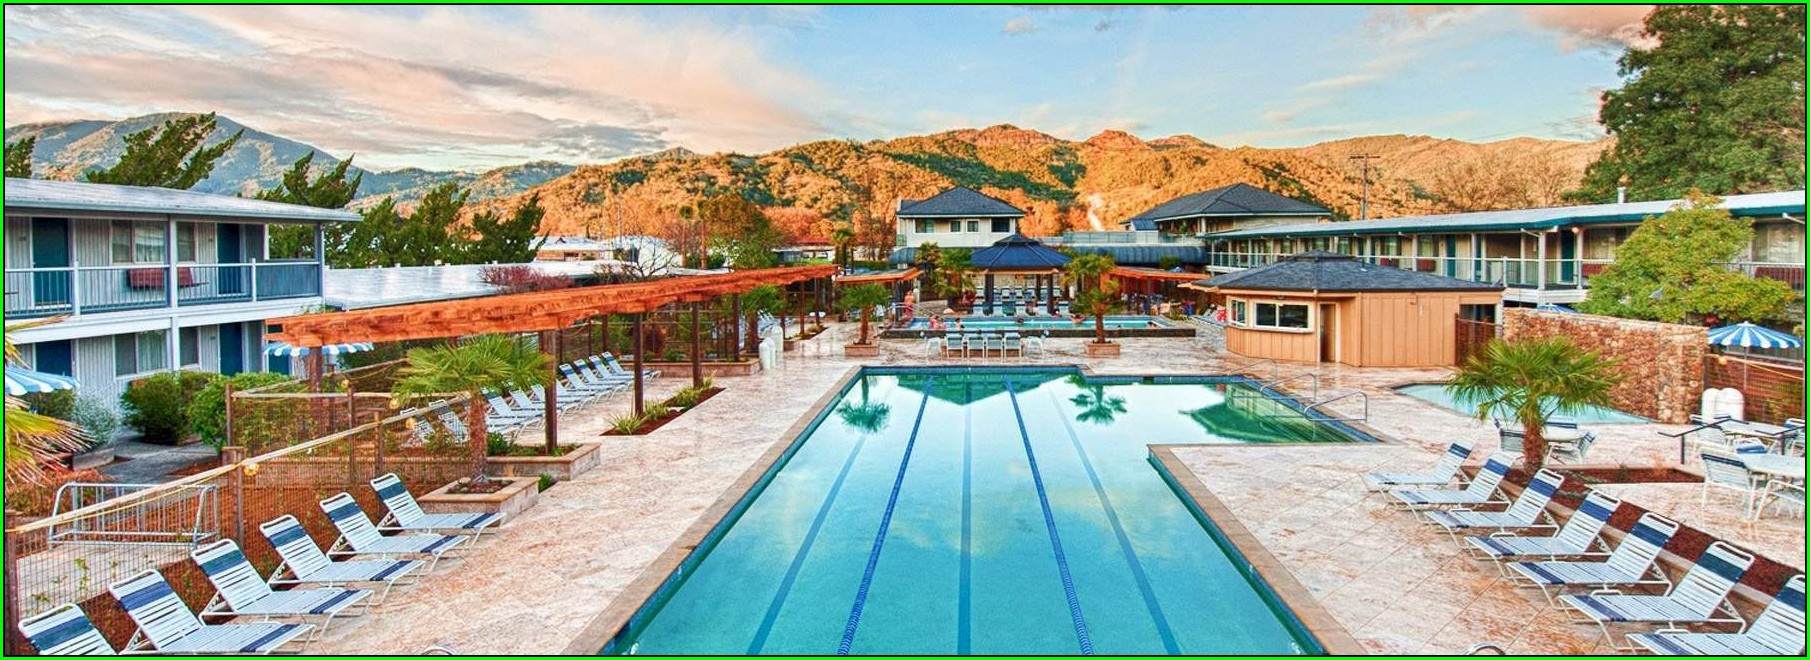 Calistoga Spa Hot Springs Room Map